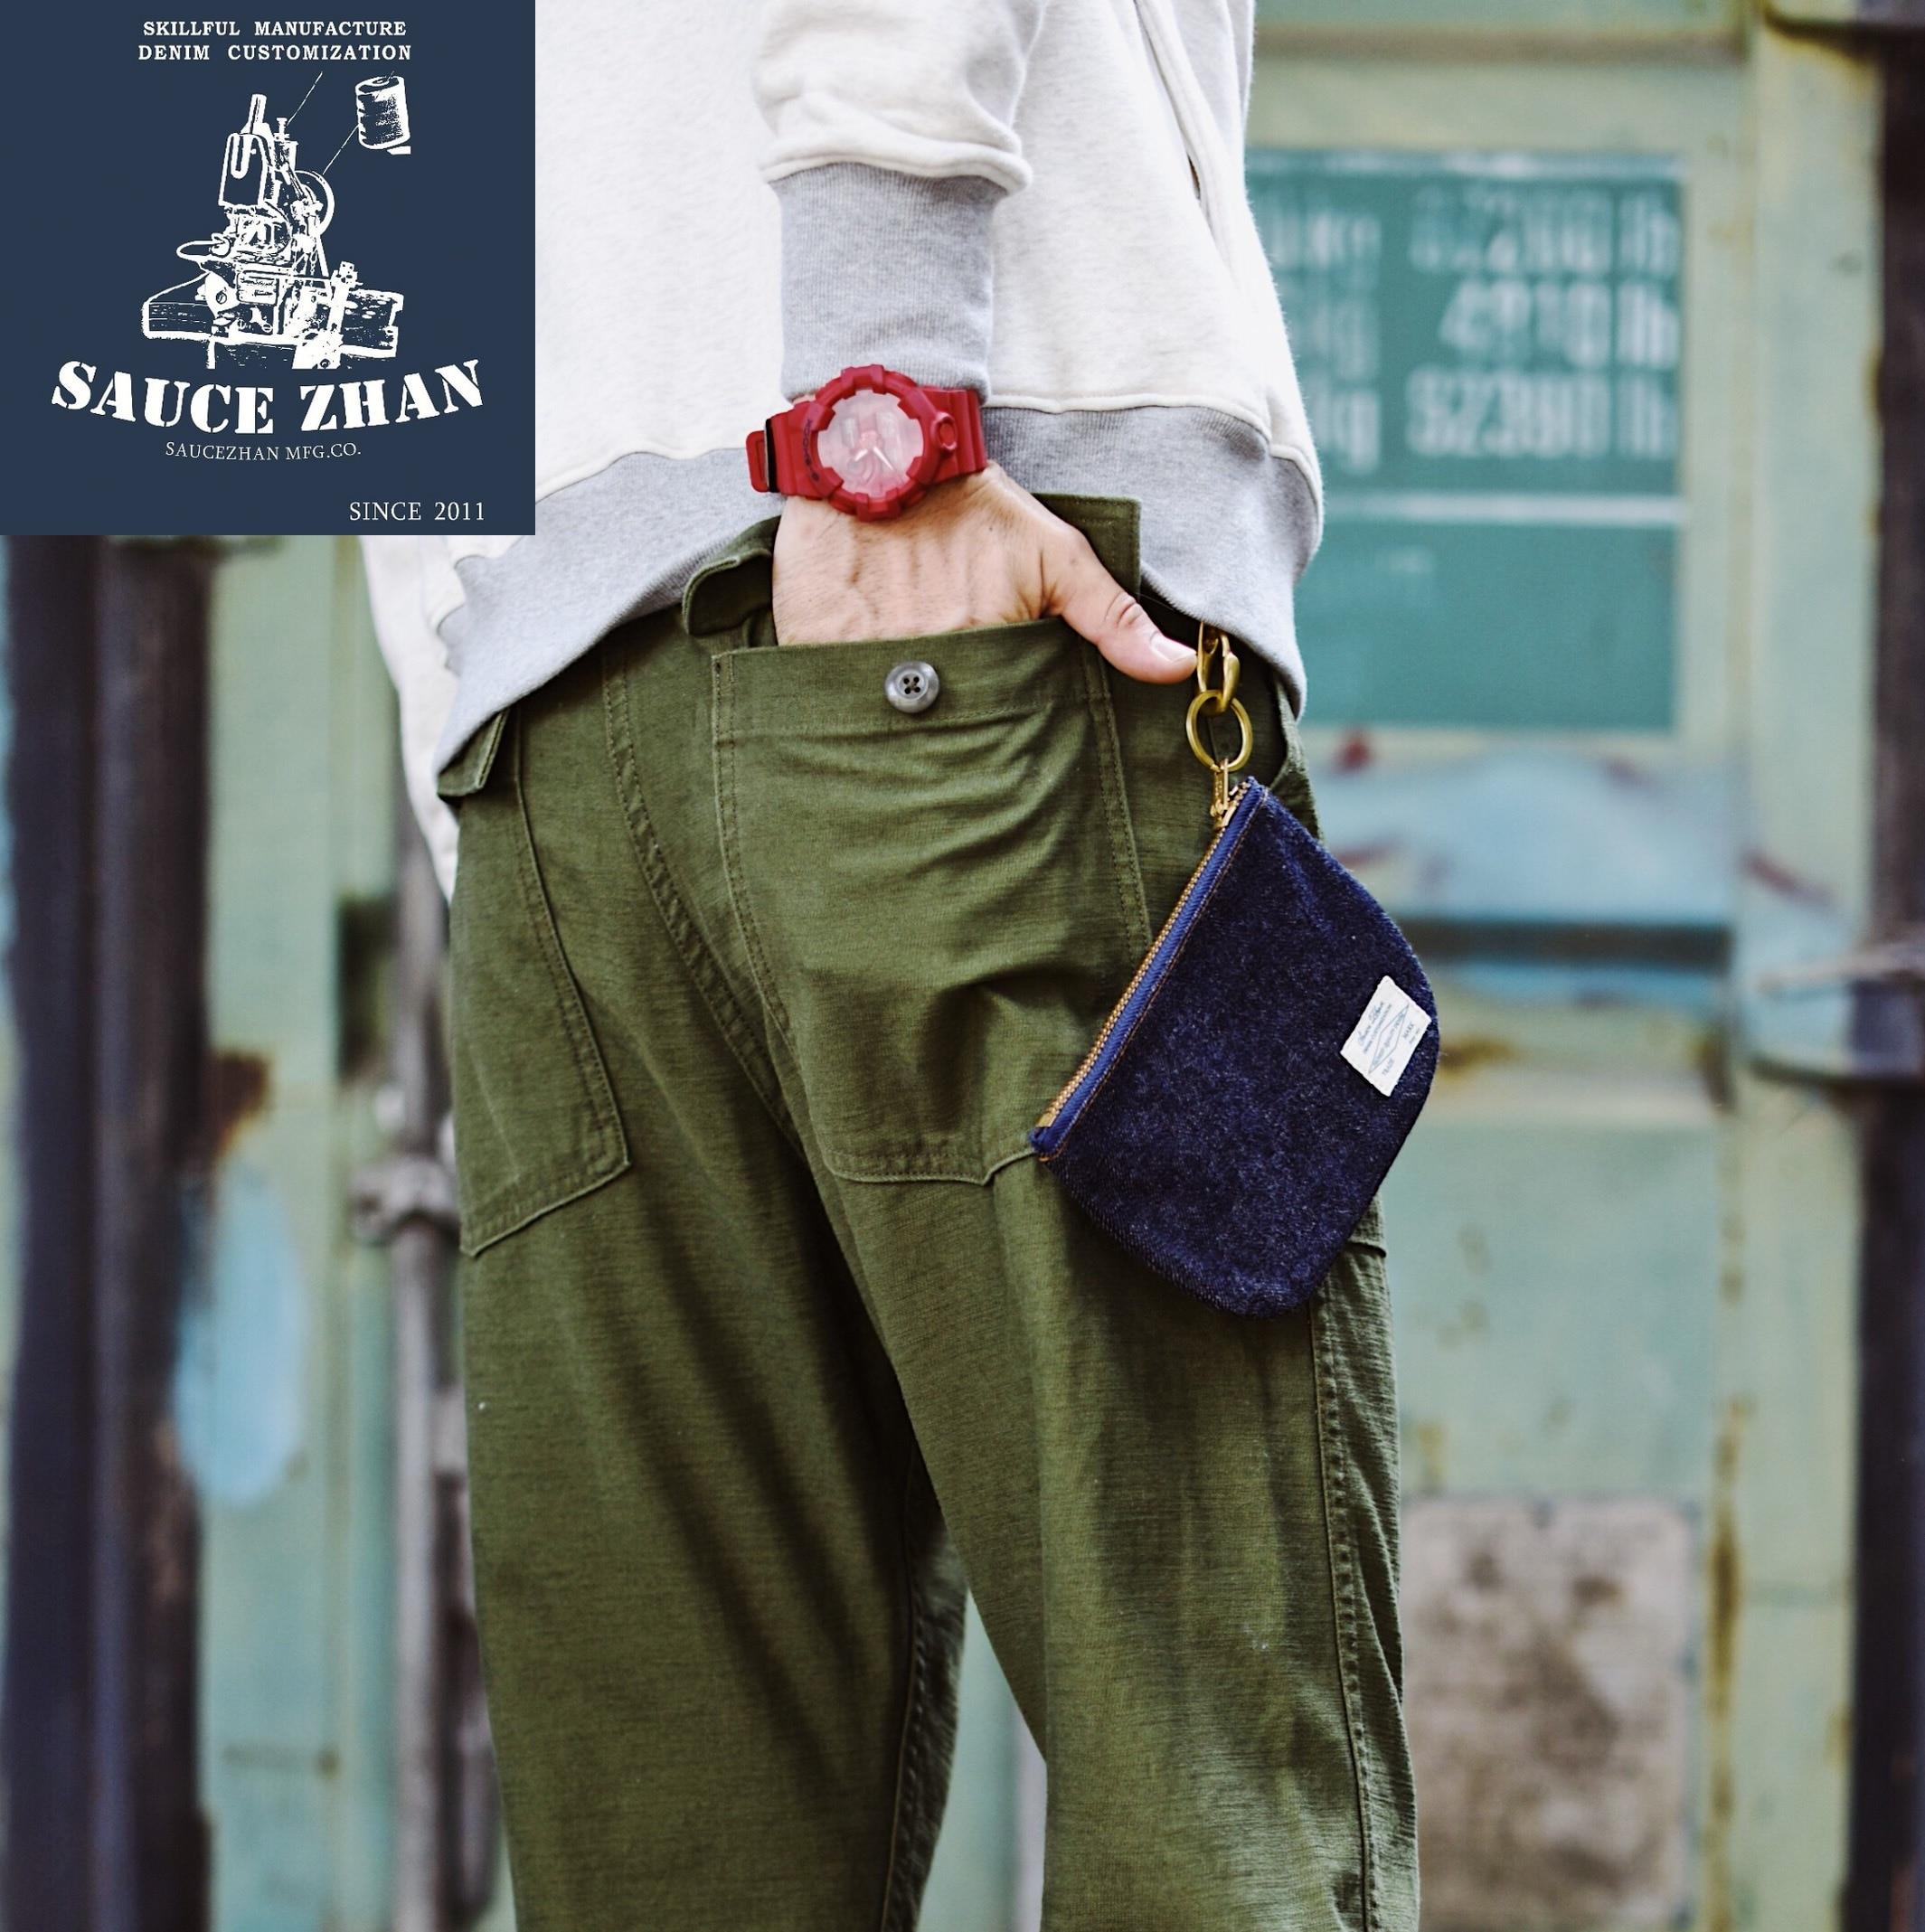 SauceZhan OG 107 疲労ユーティリティパンツミリタリーパンツレトロビンテージクラシックズボンメンズパンツパンパンツ  グループ上の メンズ服 からの カジュアル パンツ の中 2